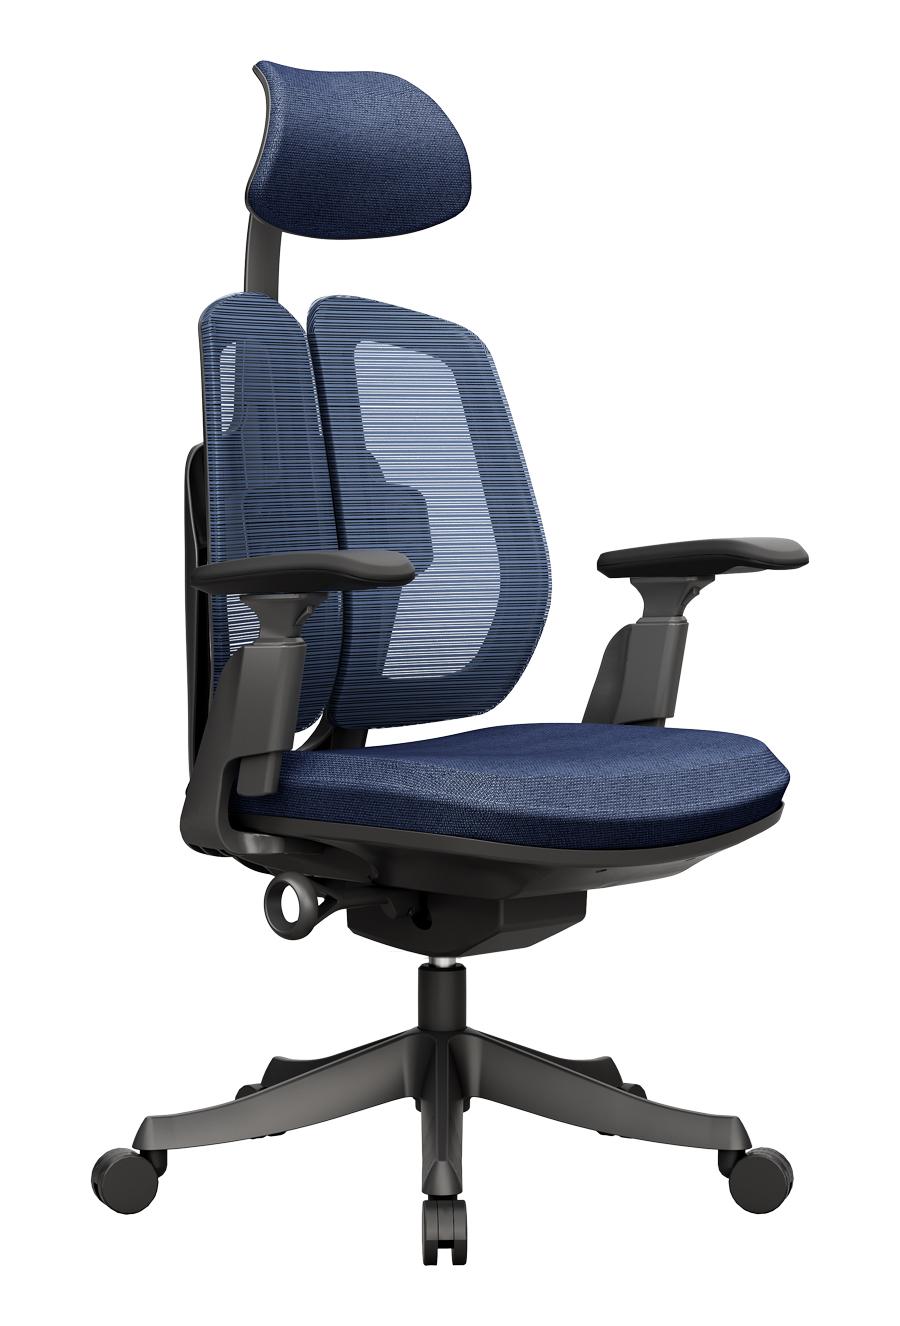 Dualmax_電腦椅_雙背椅_藍色_正斜面照片